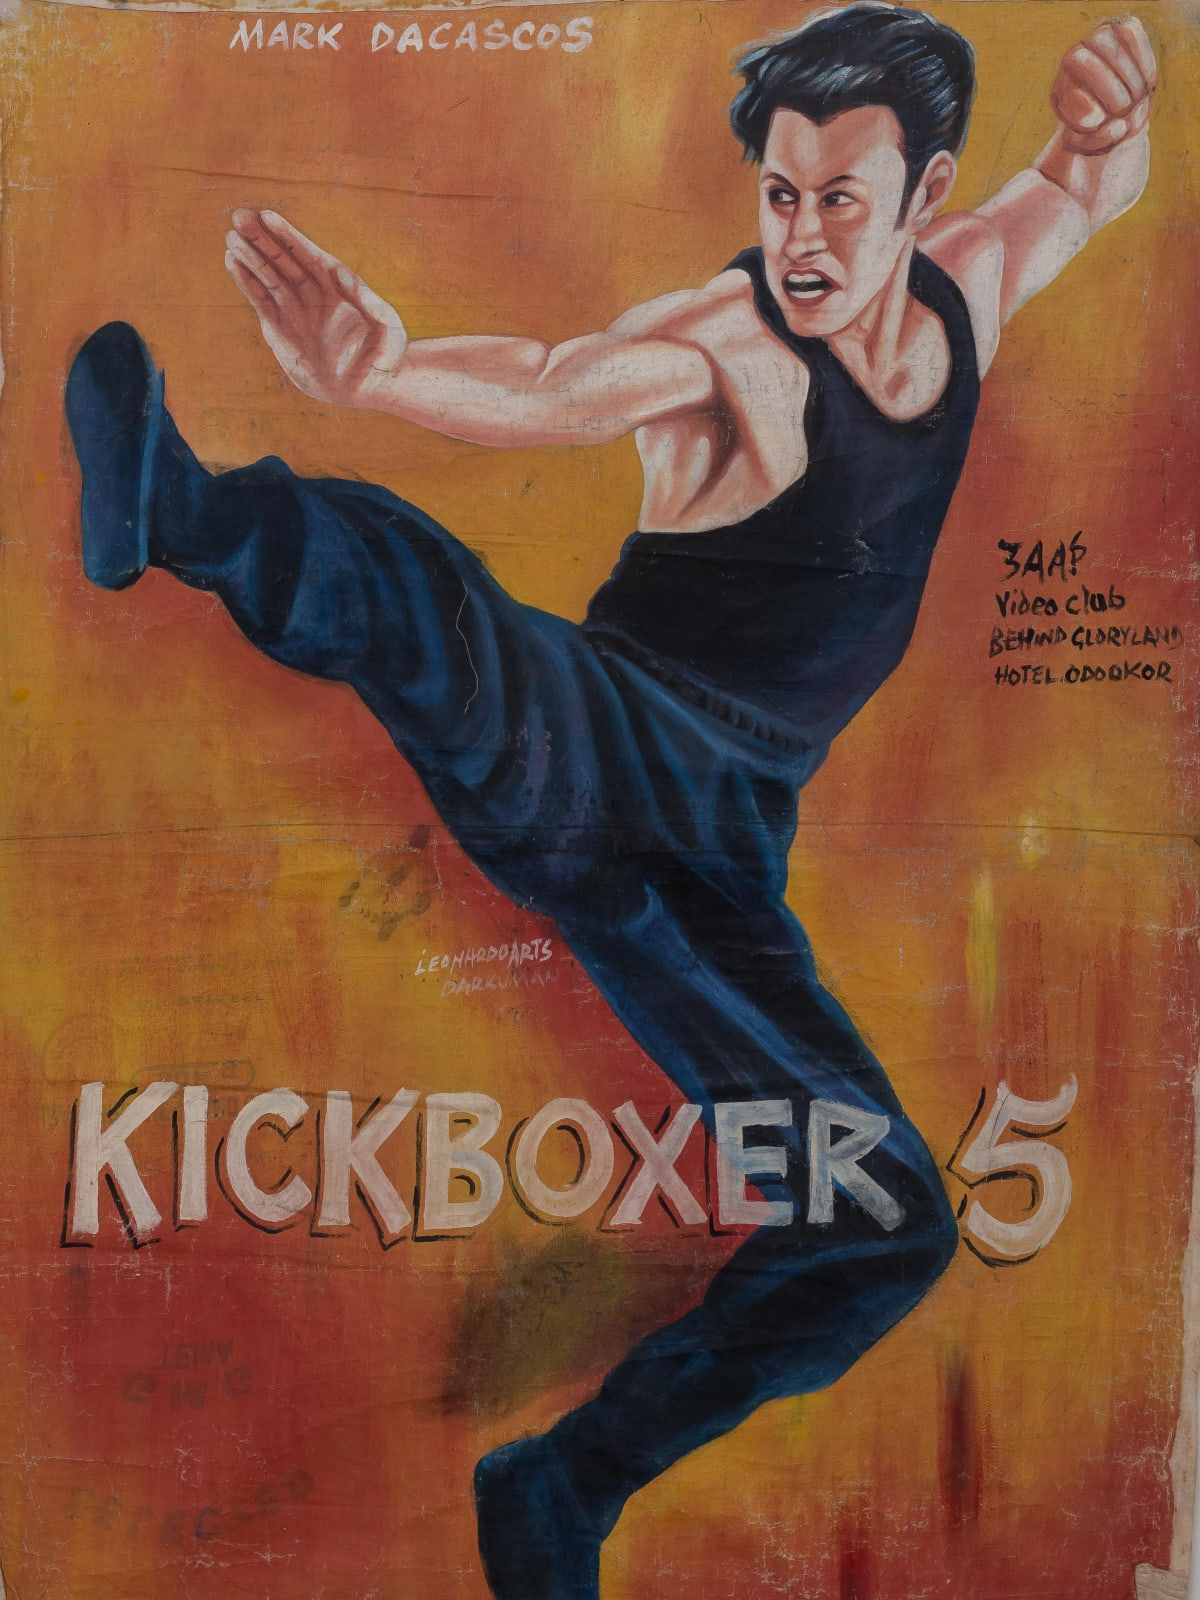 Kickboxer 5 158 x 115 cm